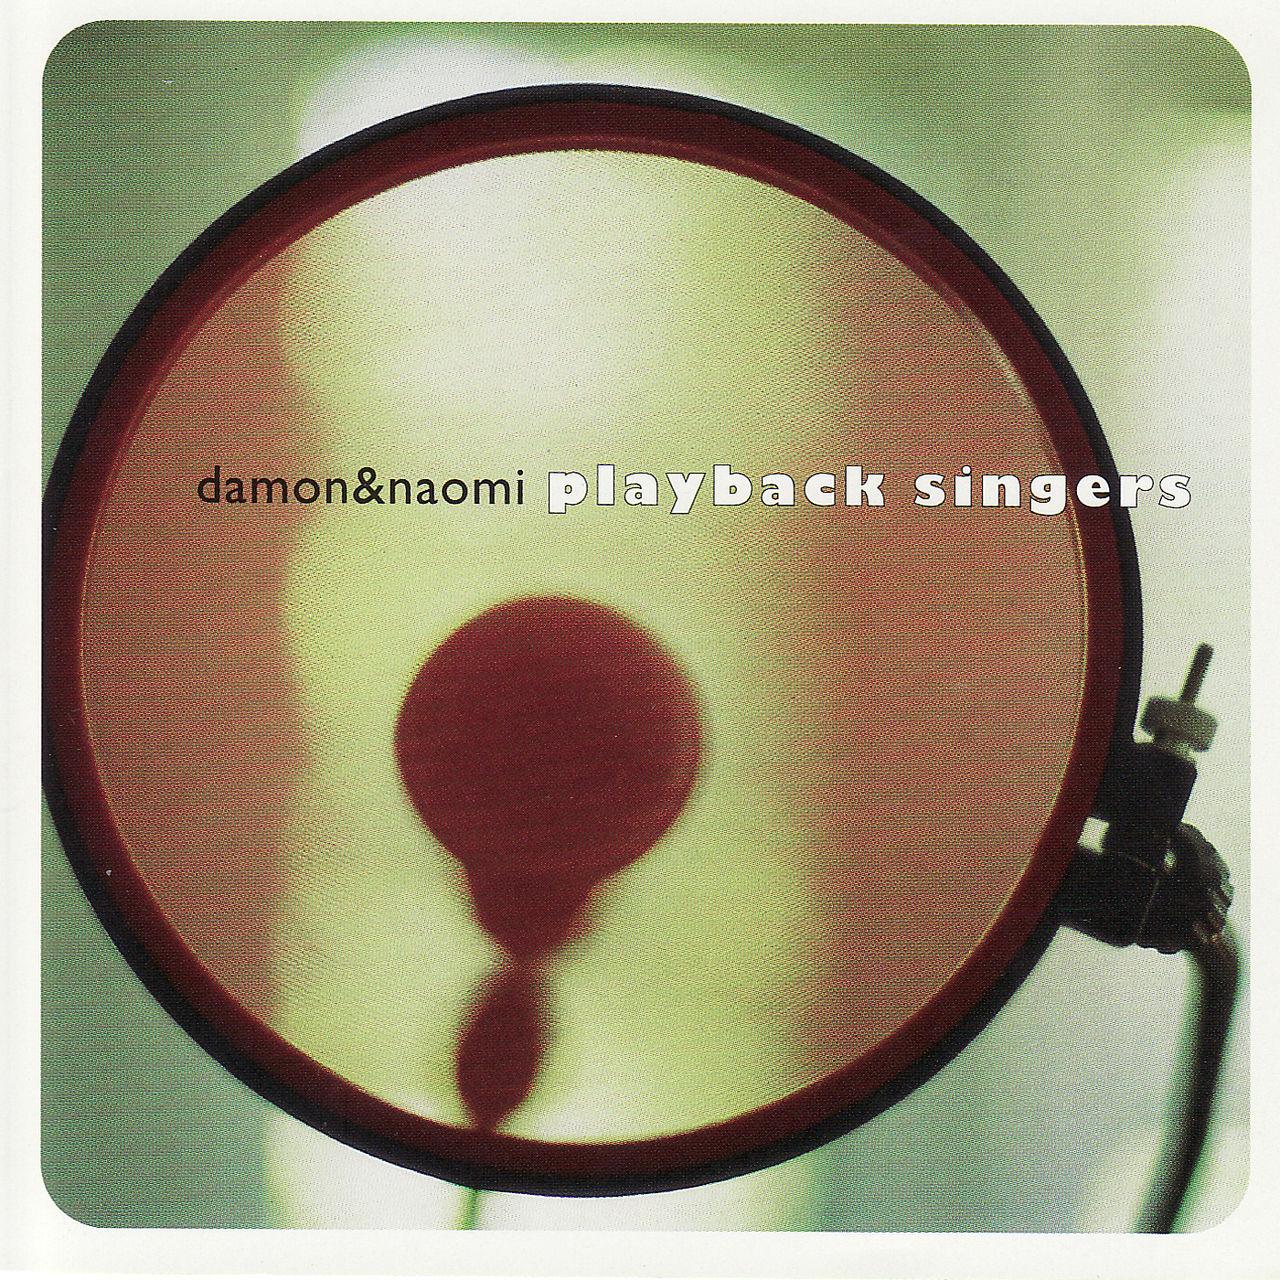 Playback Singers sleeve image